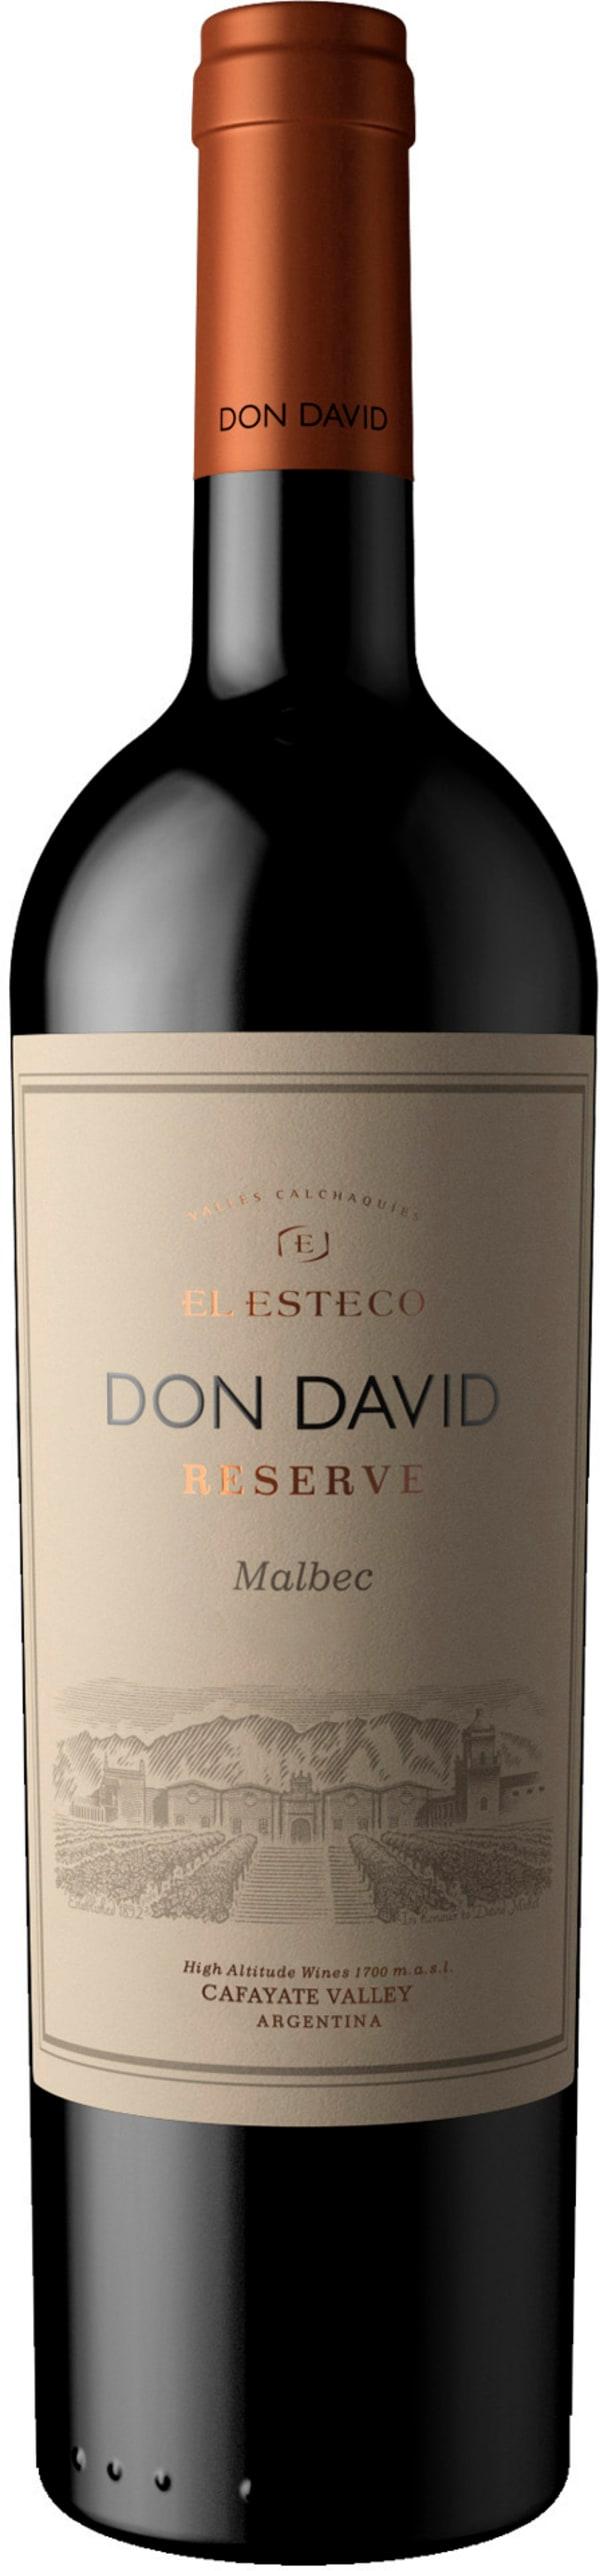 Don David Malbec Reserve 2019